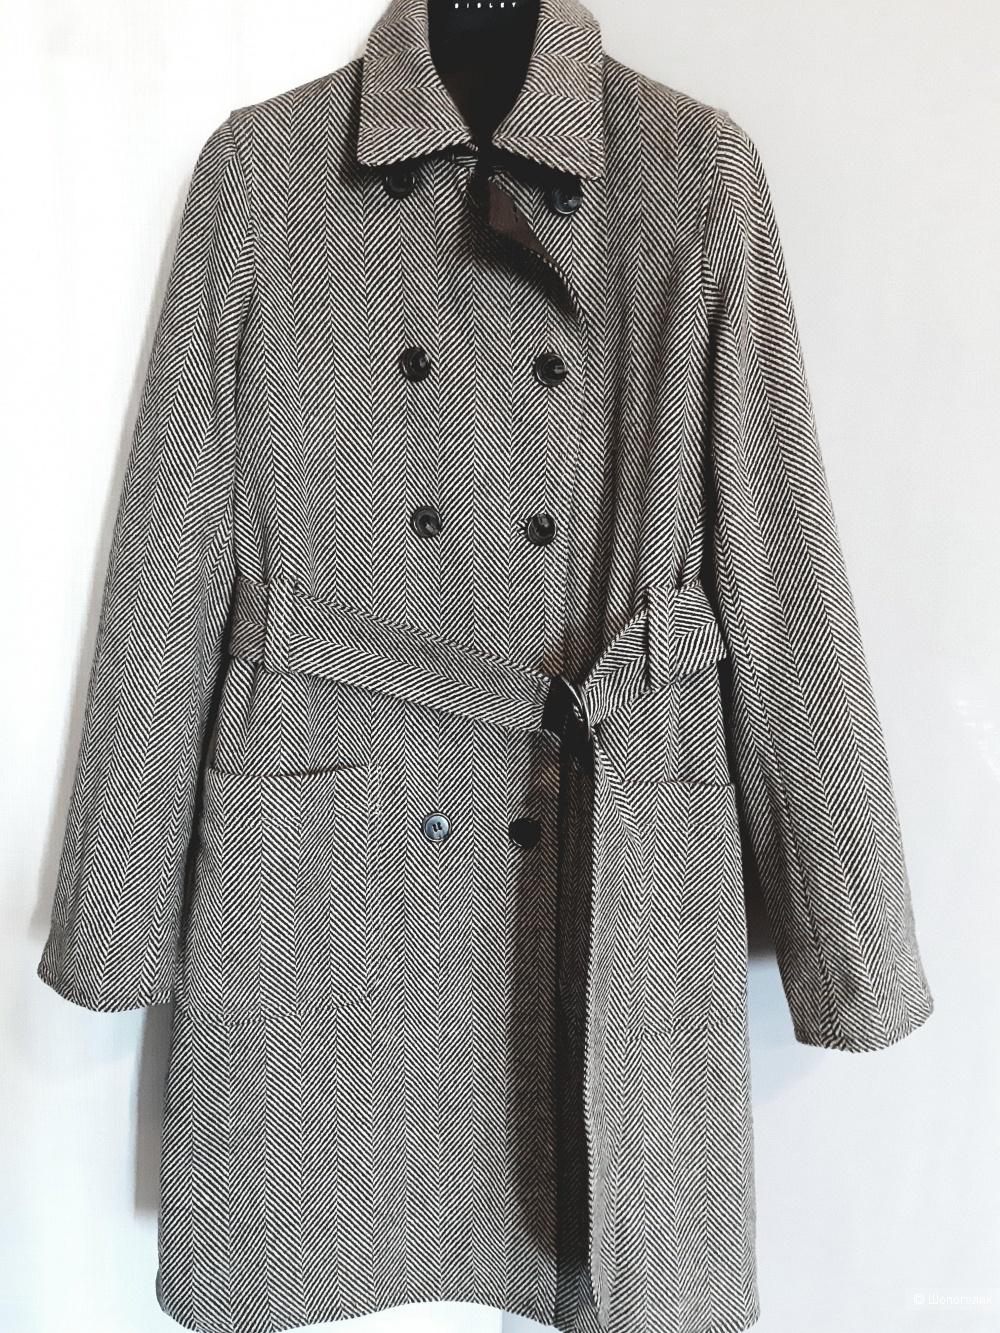 Пальто-тренч  Mango, размер  S